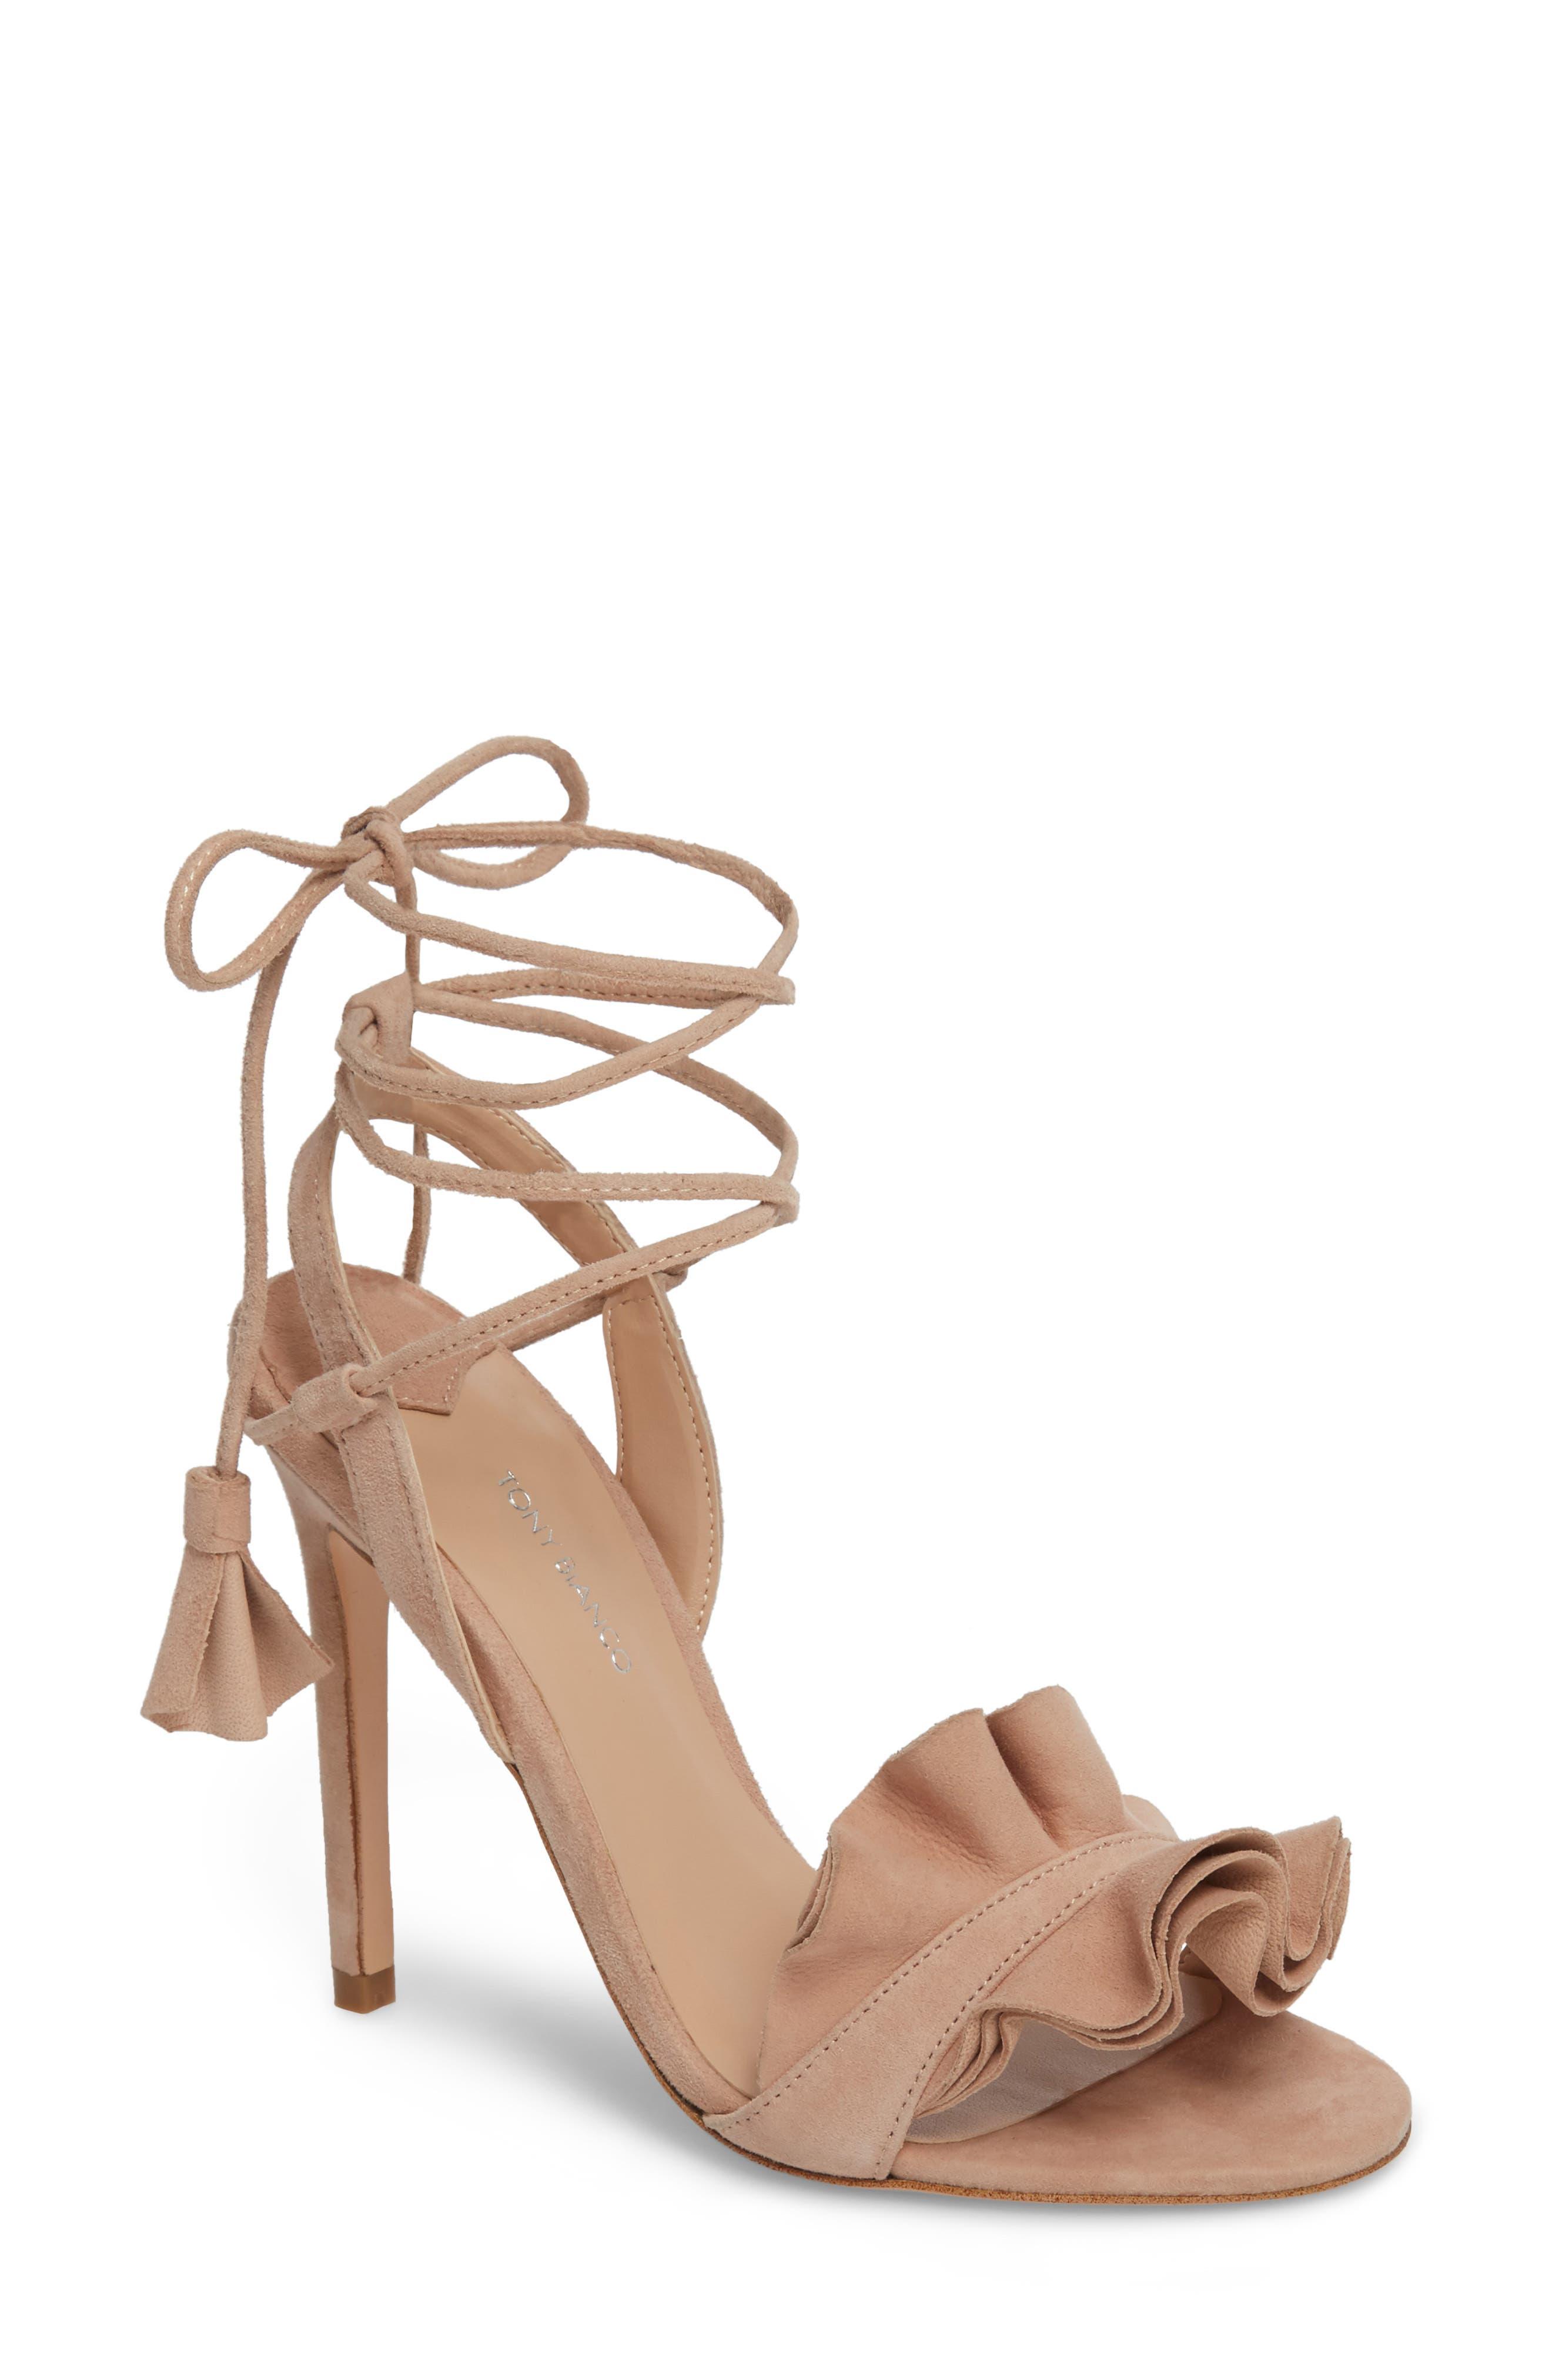 Kalipso Ruffled Wraparound Sandal,                         Main,                         color, Blush Suede